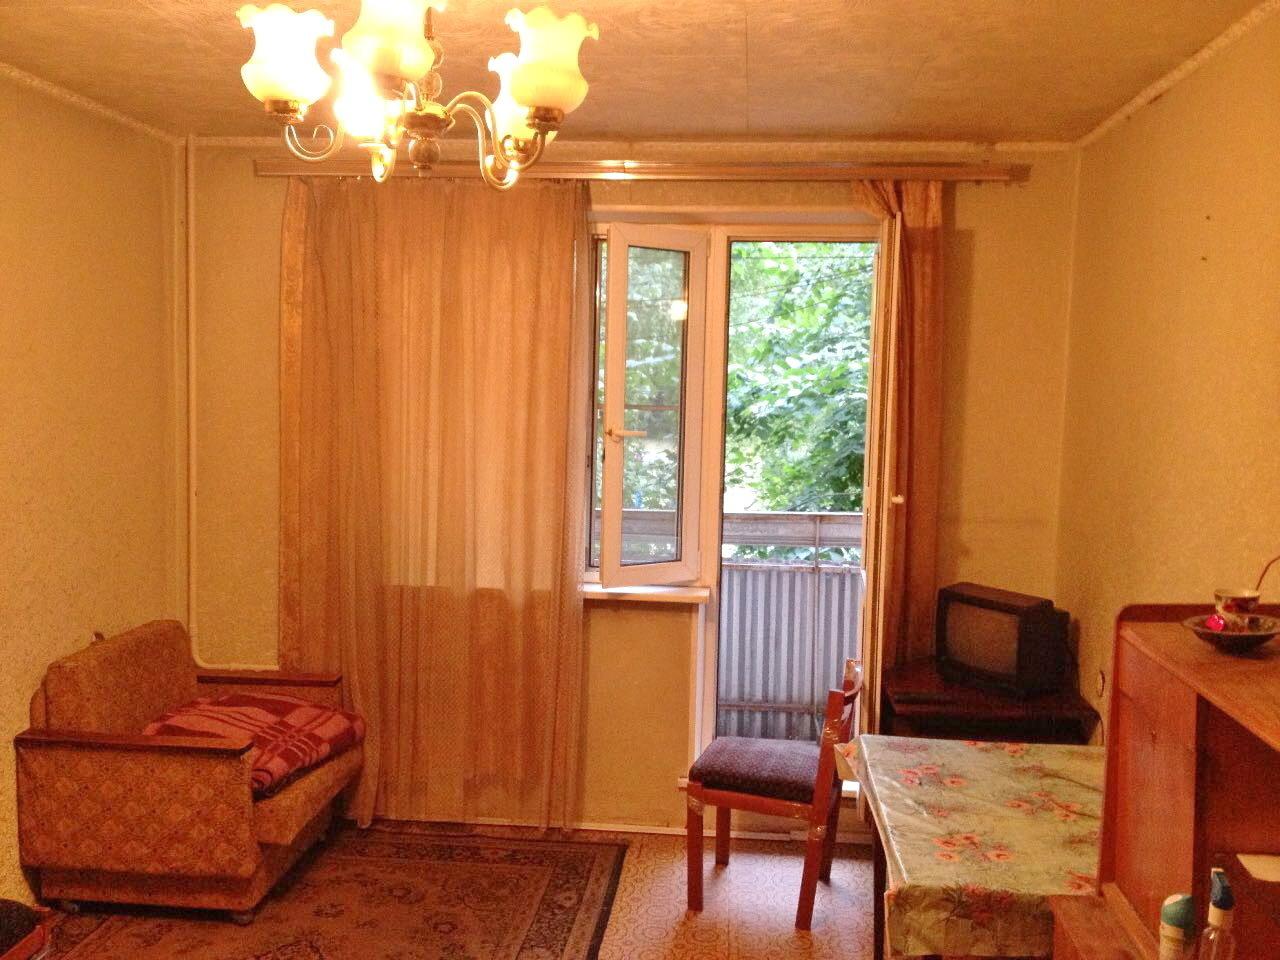 Комната 18кв.м. с балконом в 3-к квартире москва, михневский.